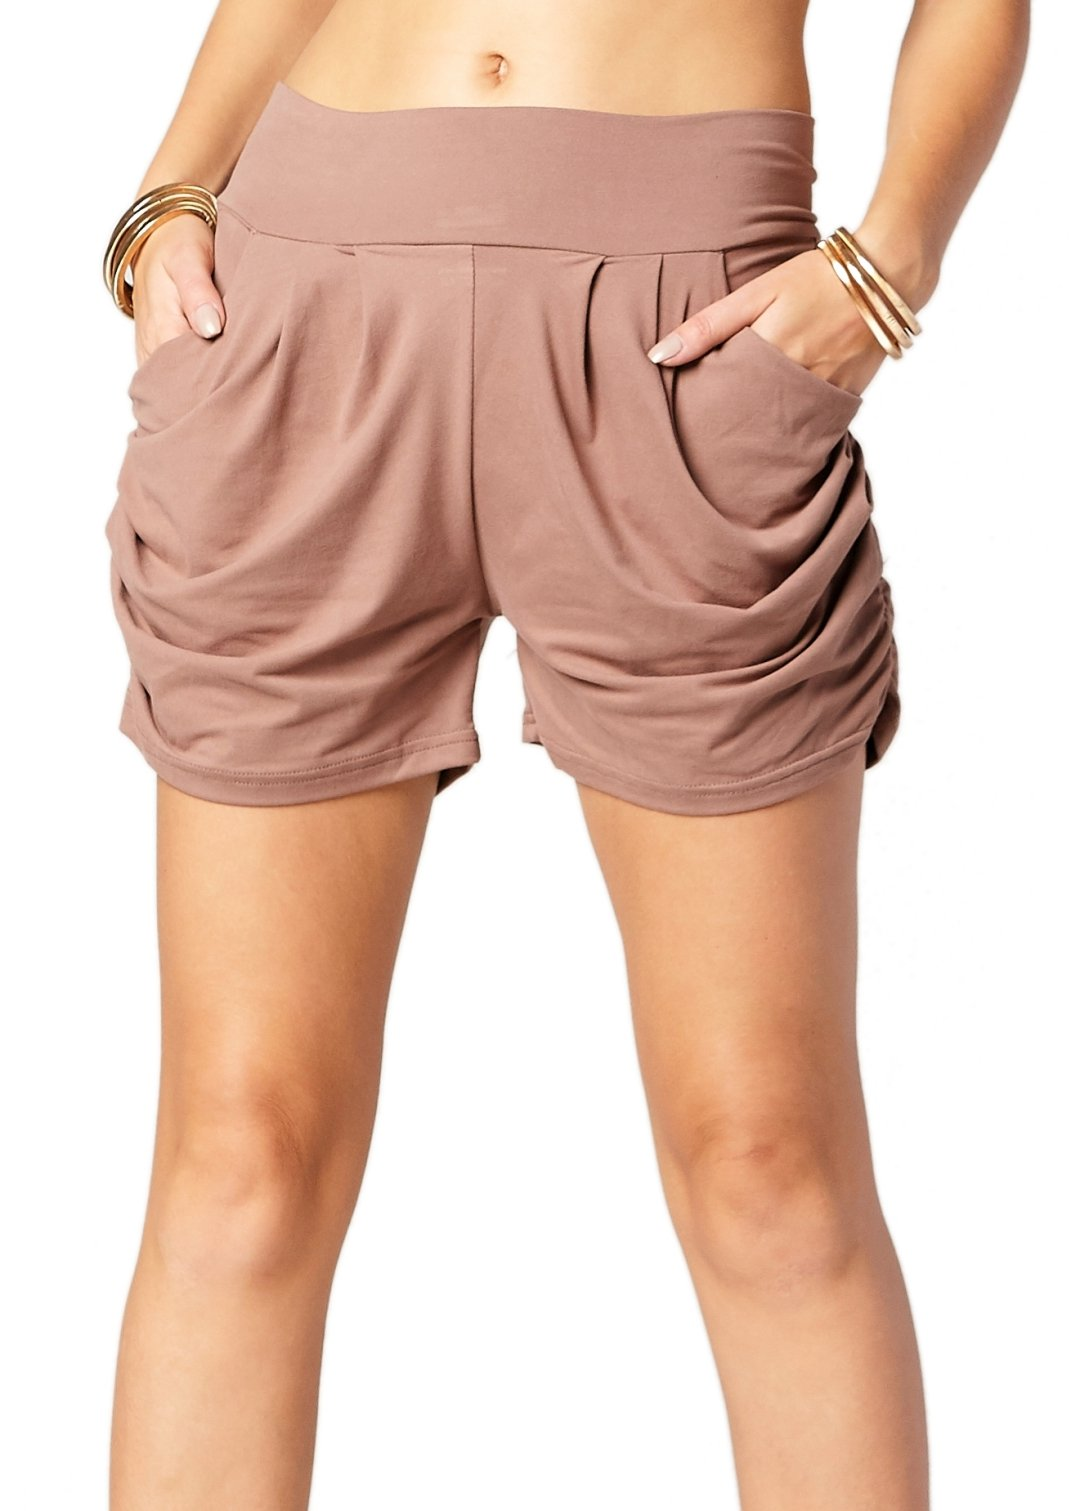 Premium Ultra Soft Harem Shorts with Pockets - 40